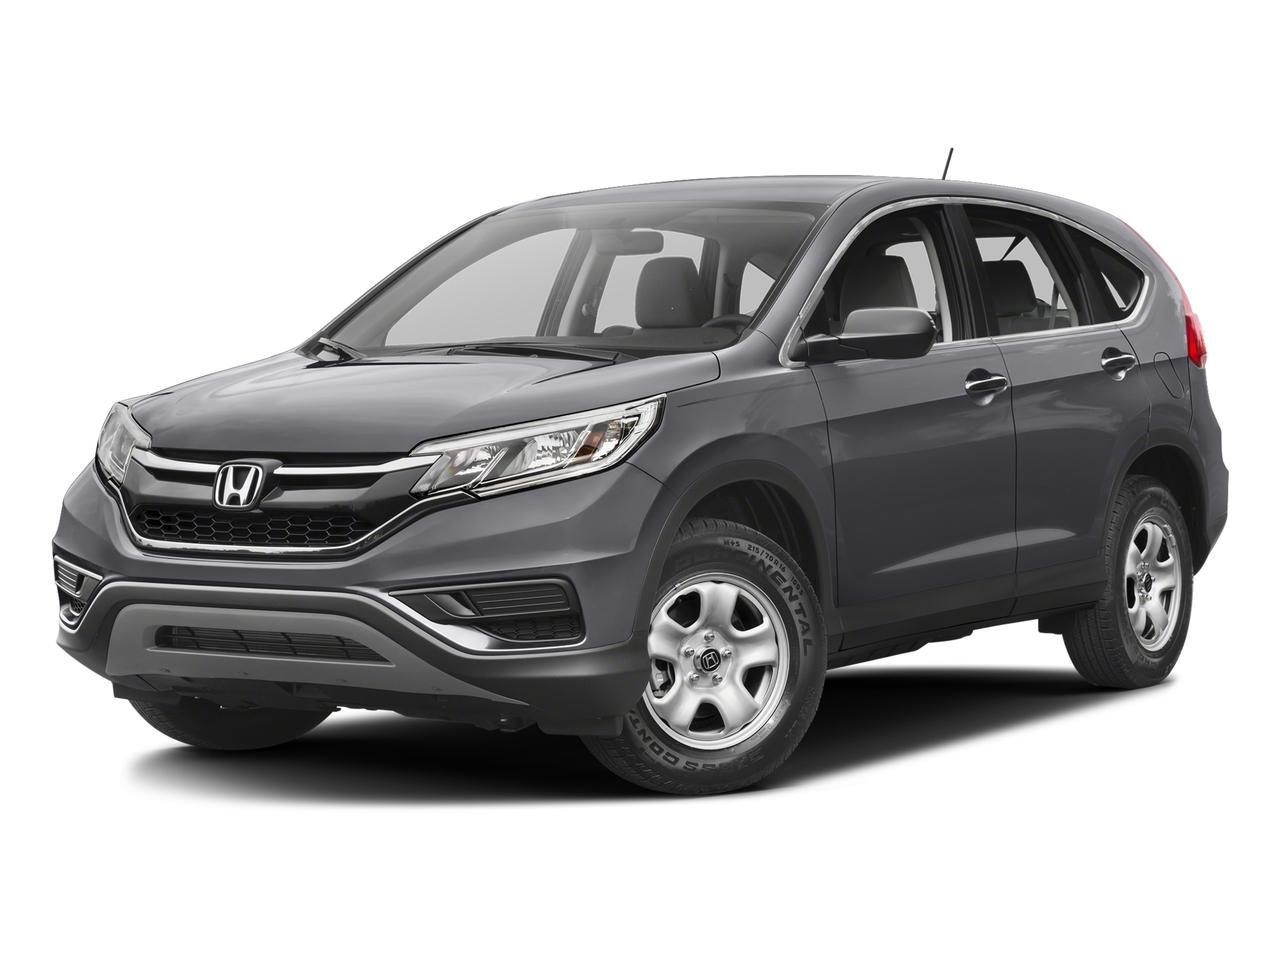 2016 Honda CR-V Vehicle Photo in Plainfield, IL 60586